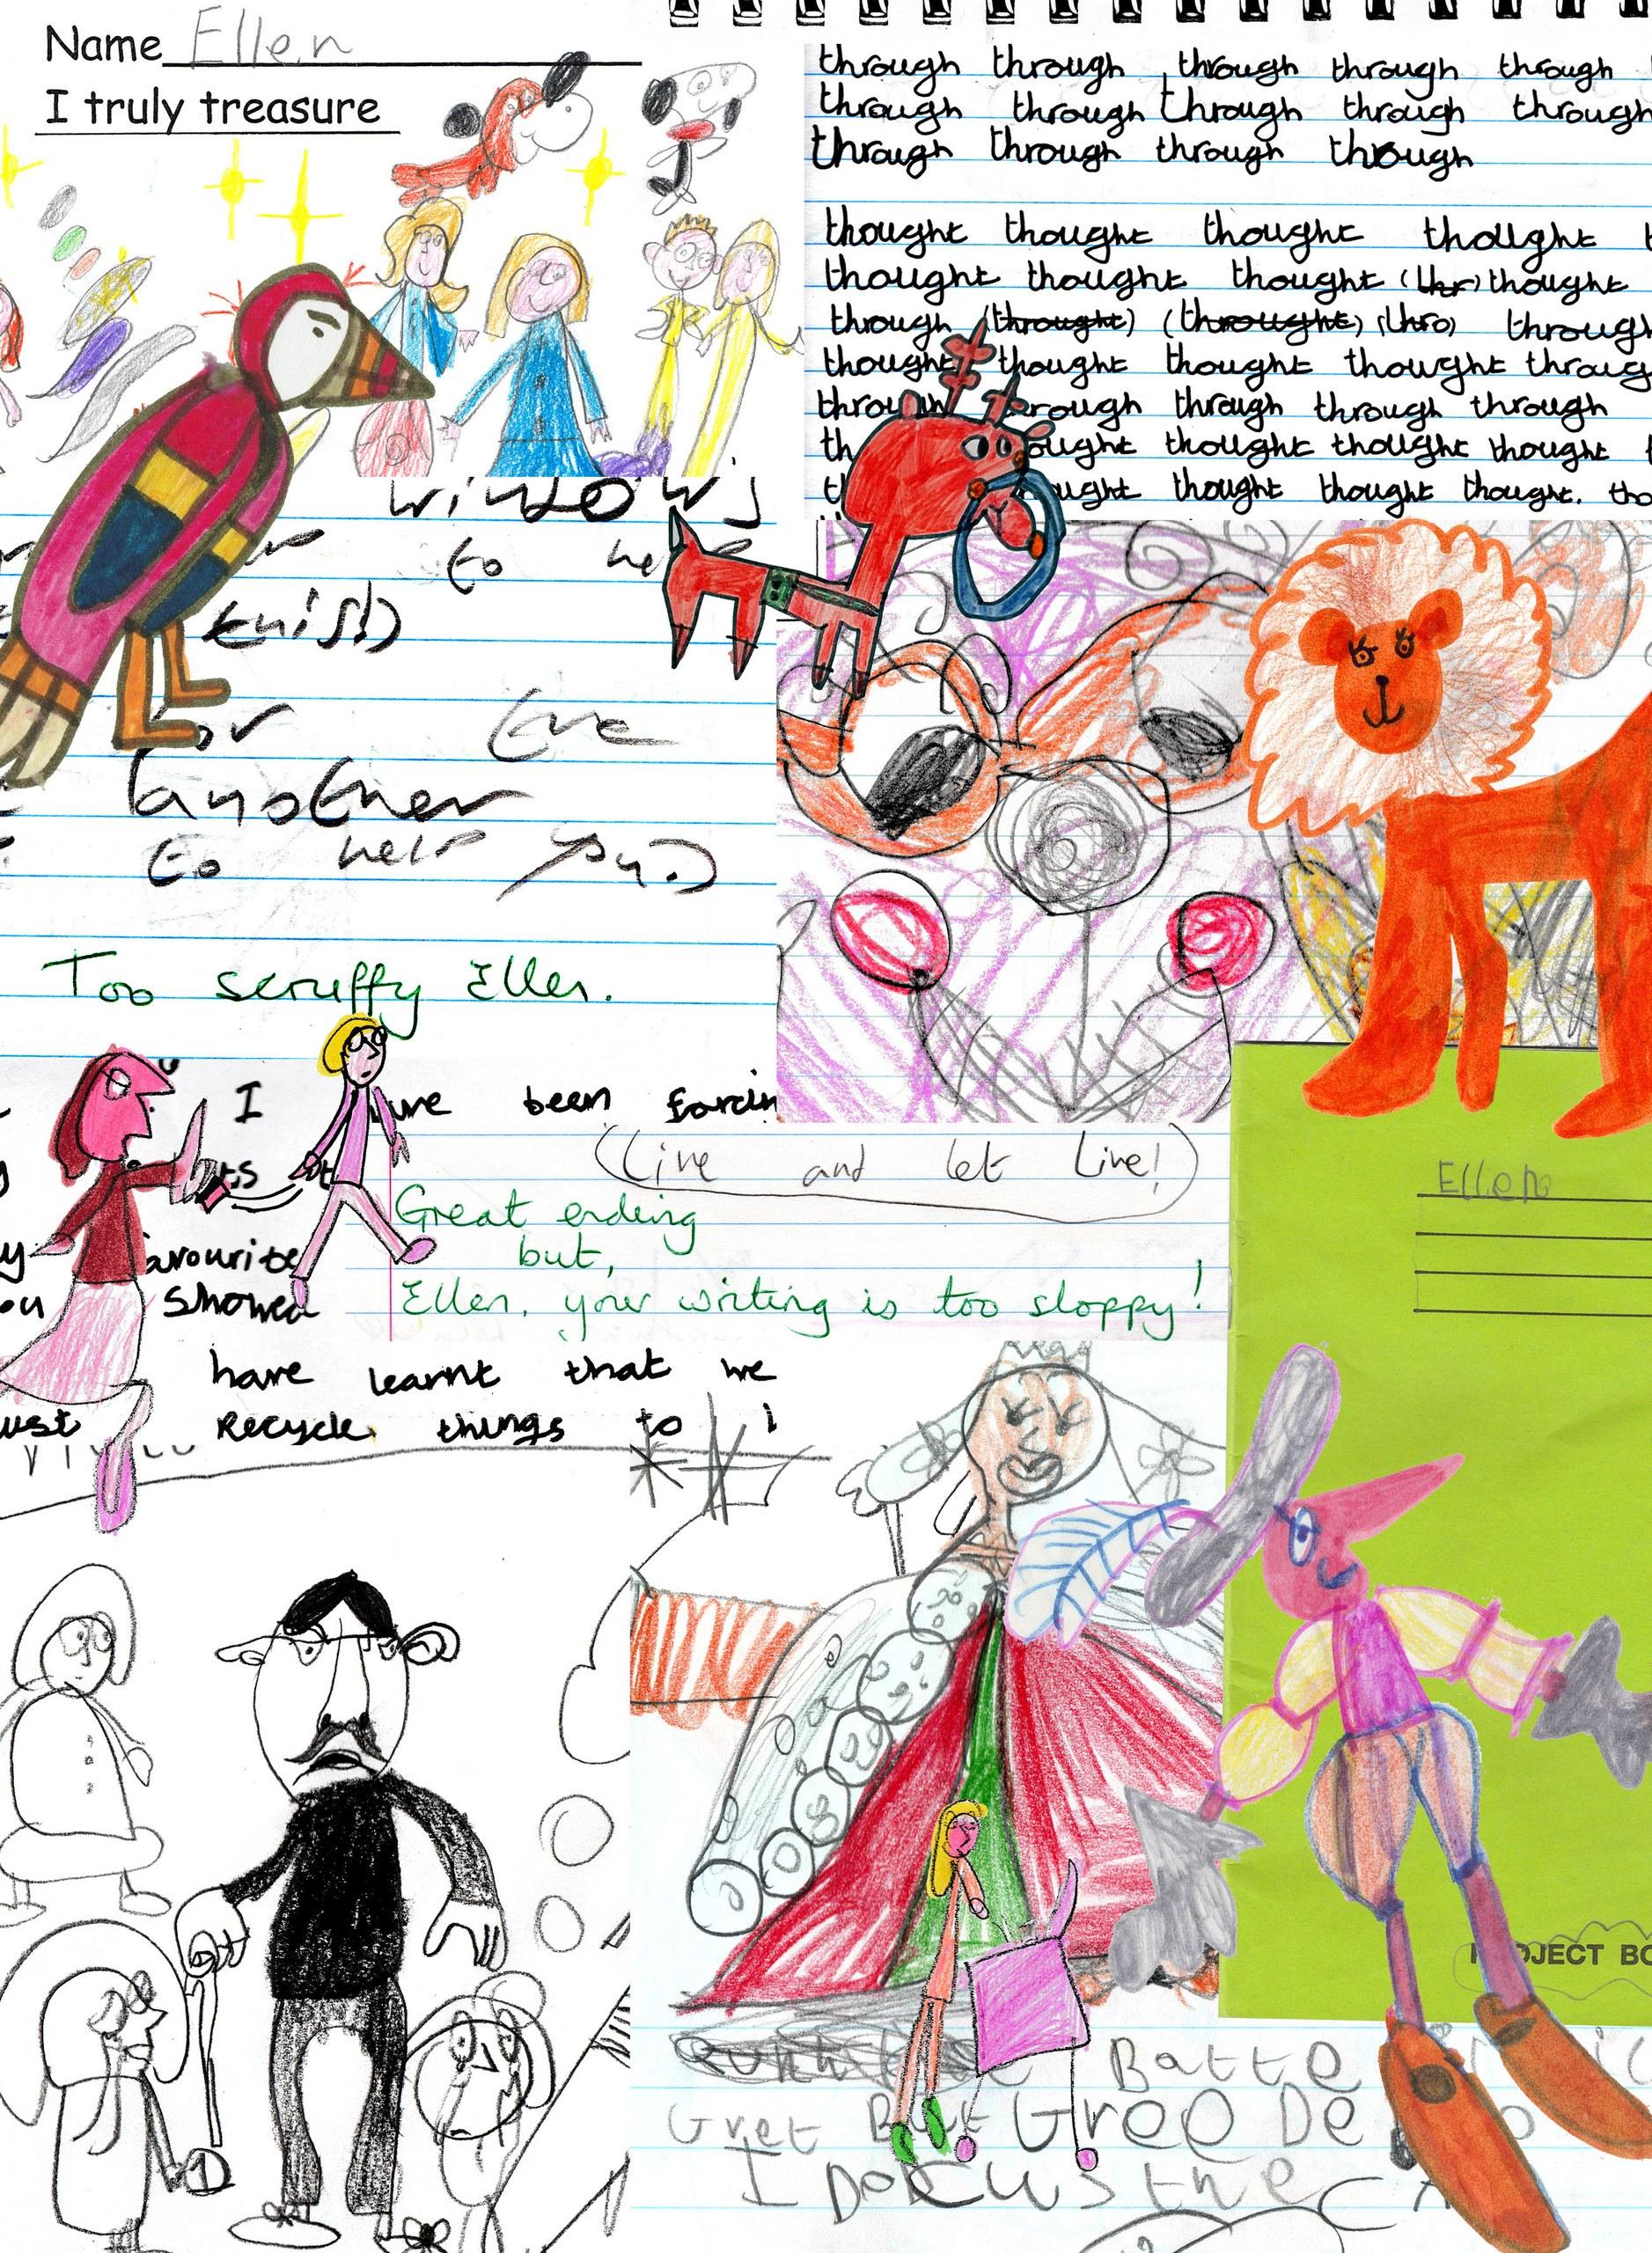 Childhood Drawings and Workbooks